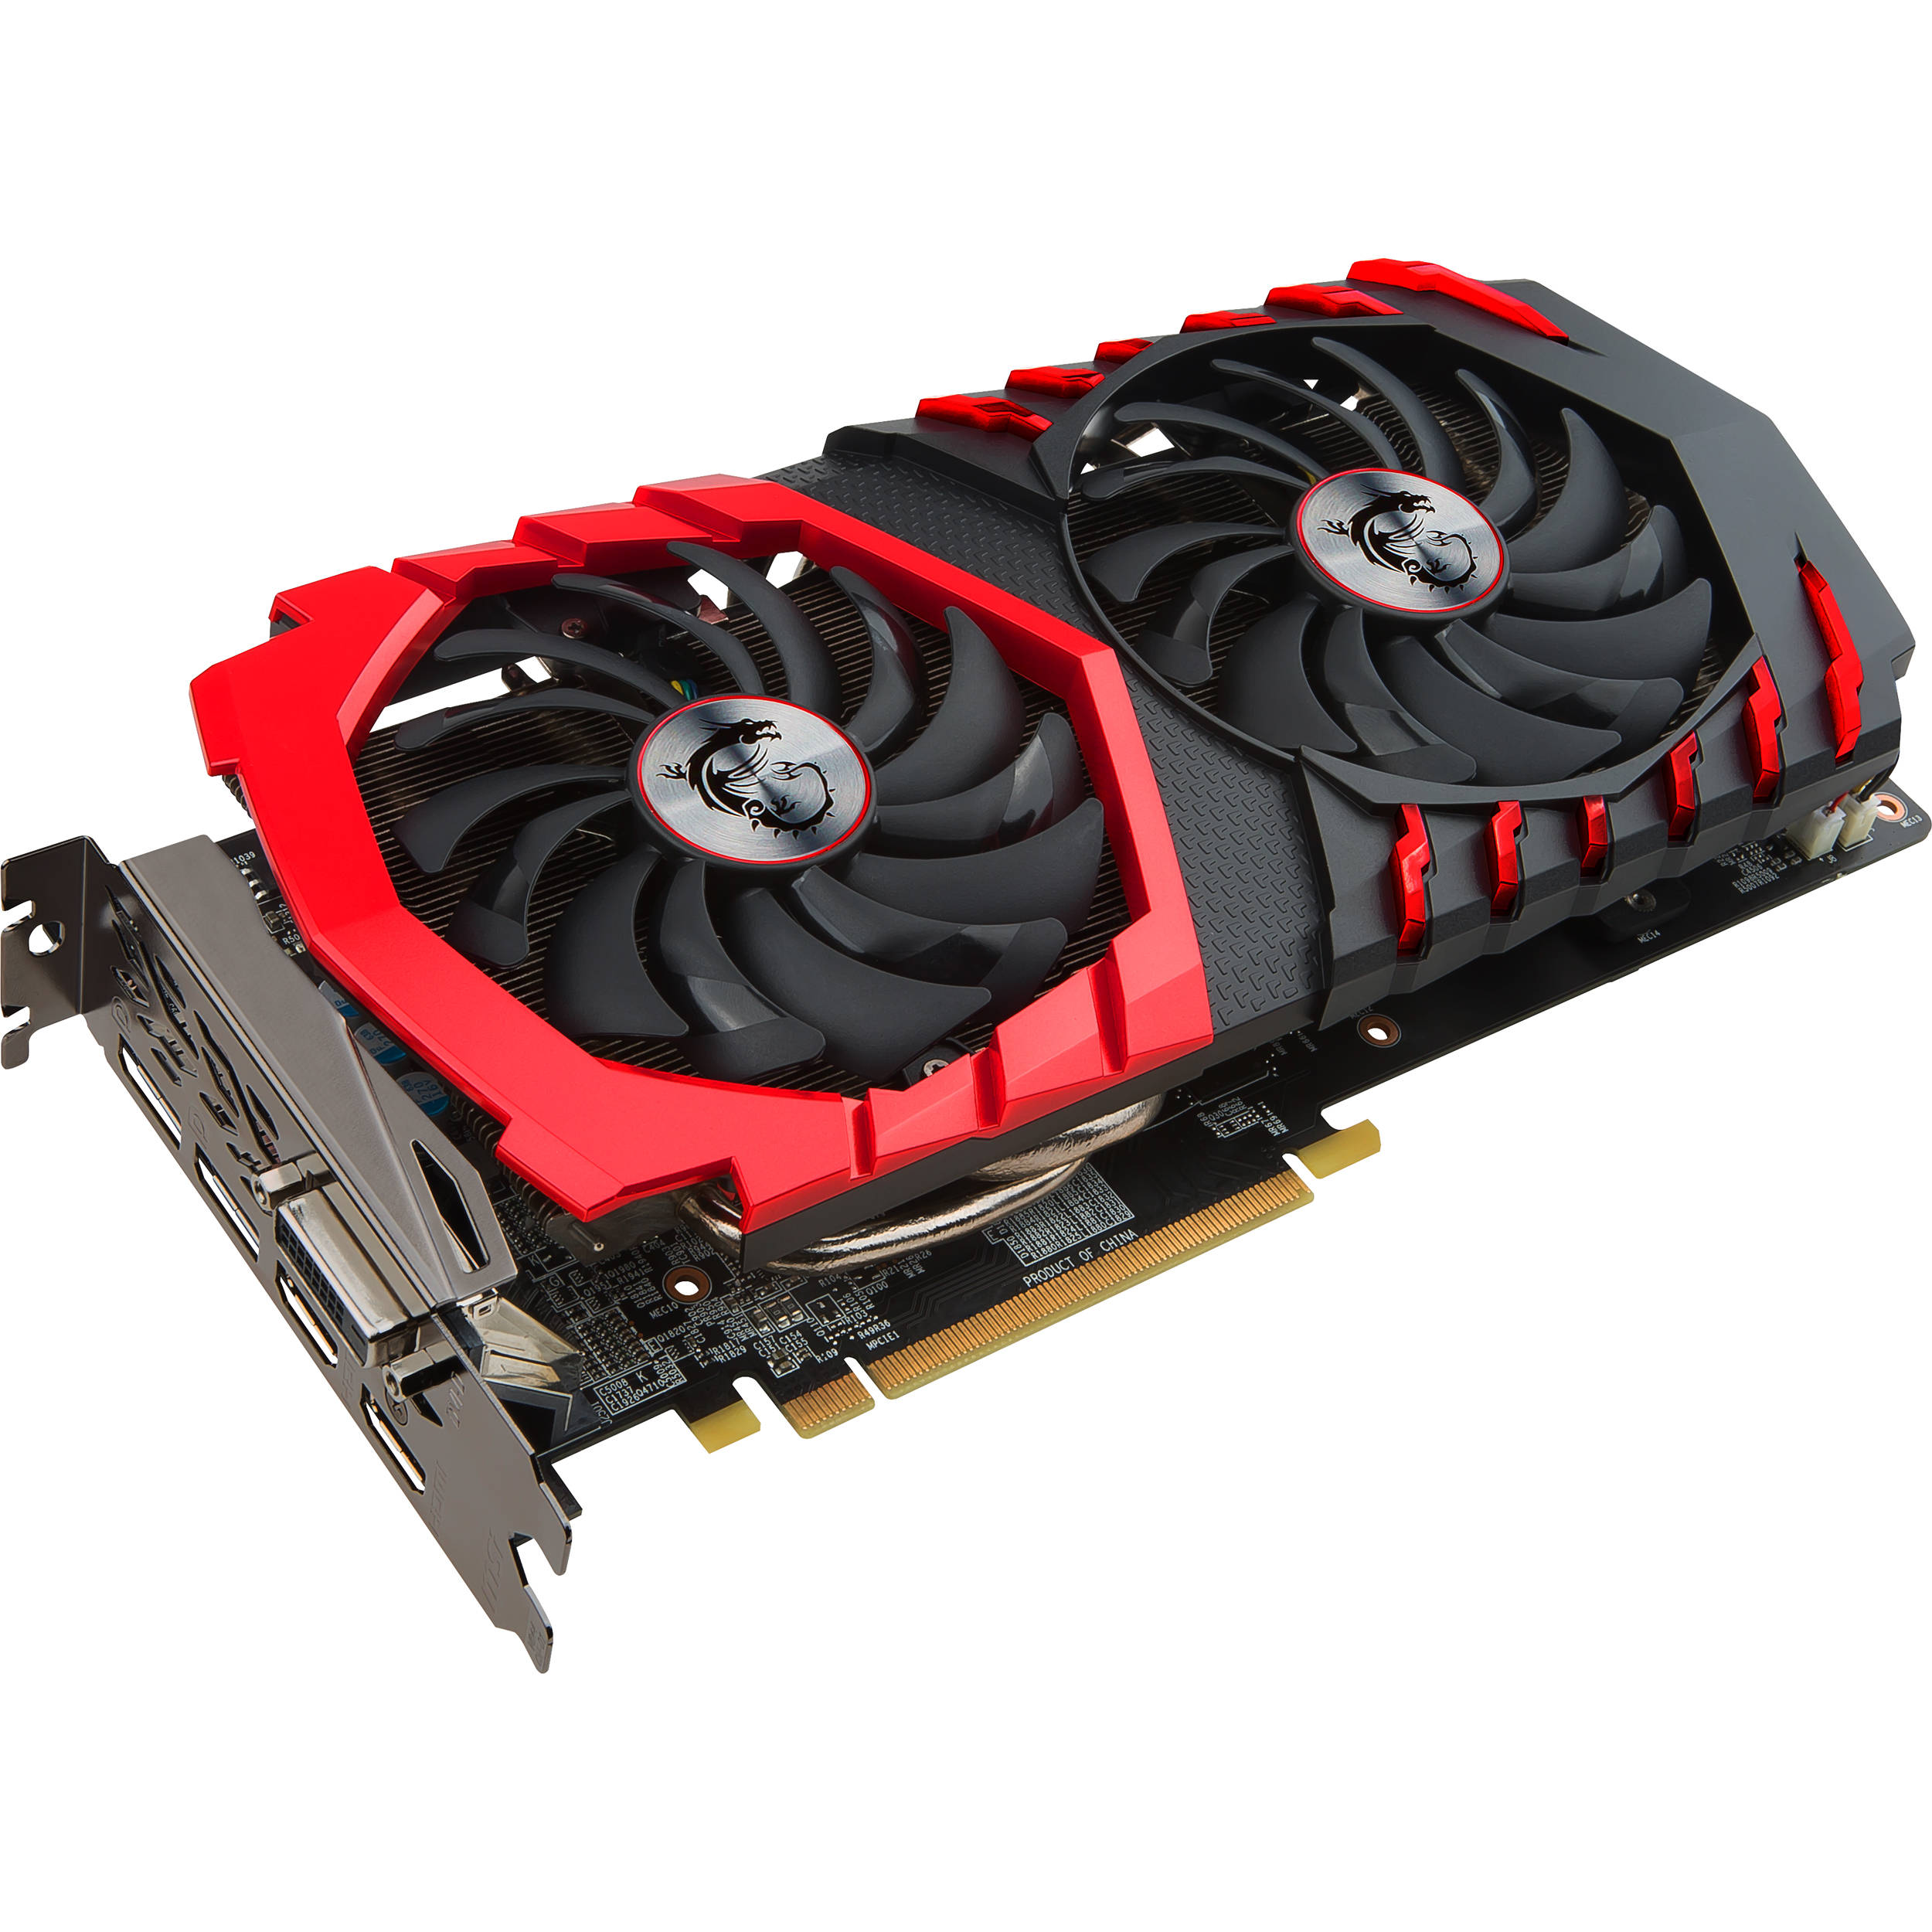 MSI Radeon RX 570 GAMING X 4G Graphics Card